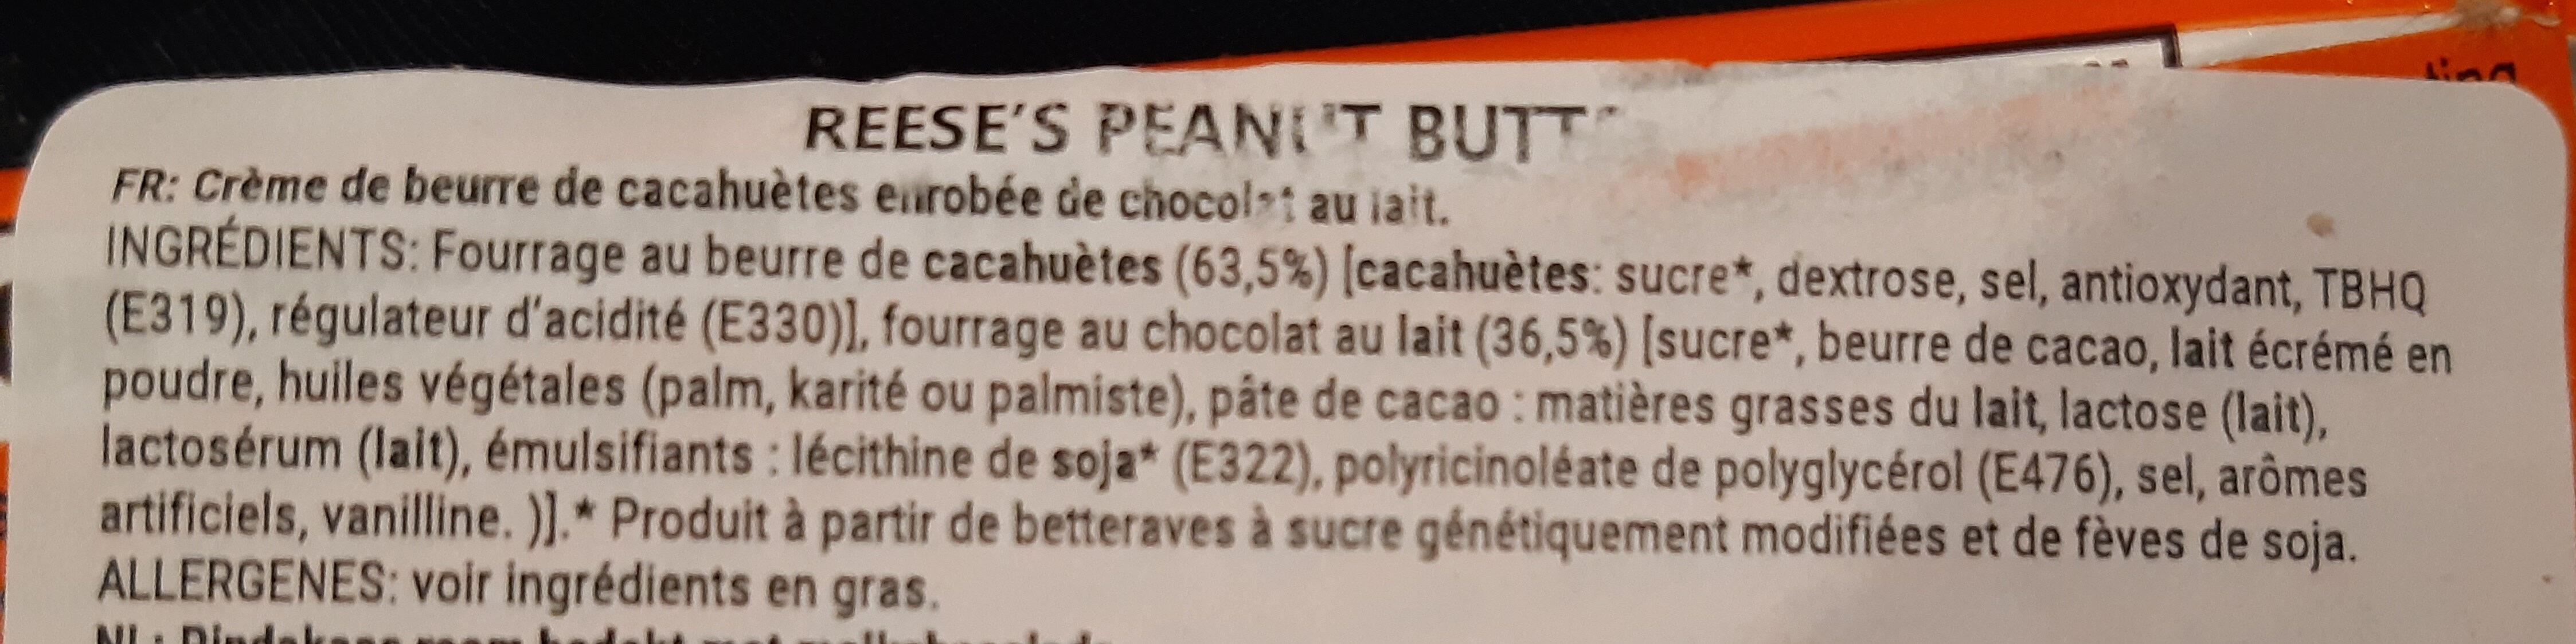 Reese's peanut butter - Ingrediënten